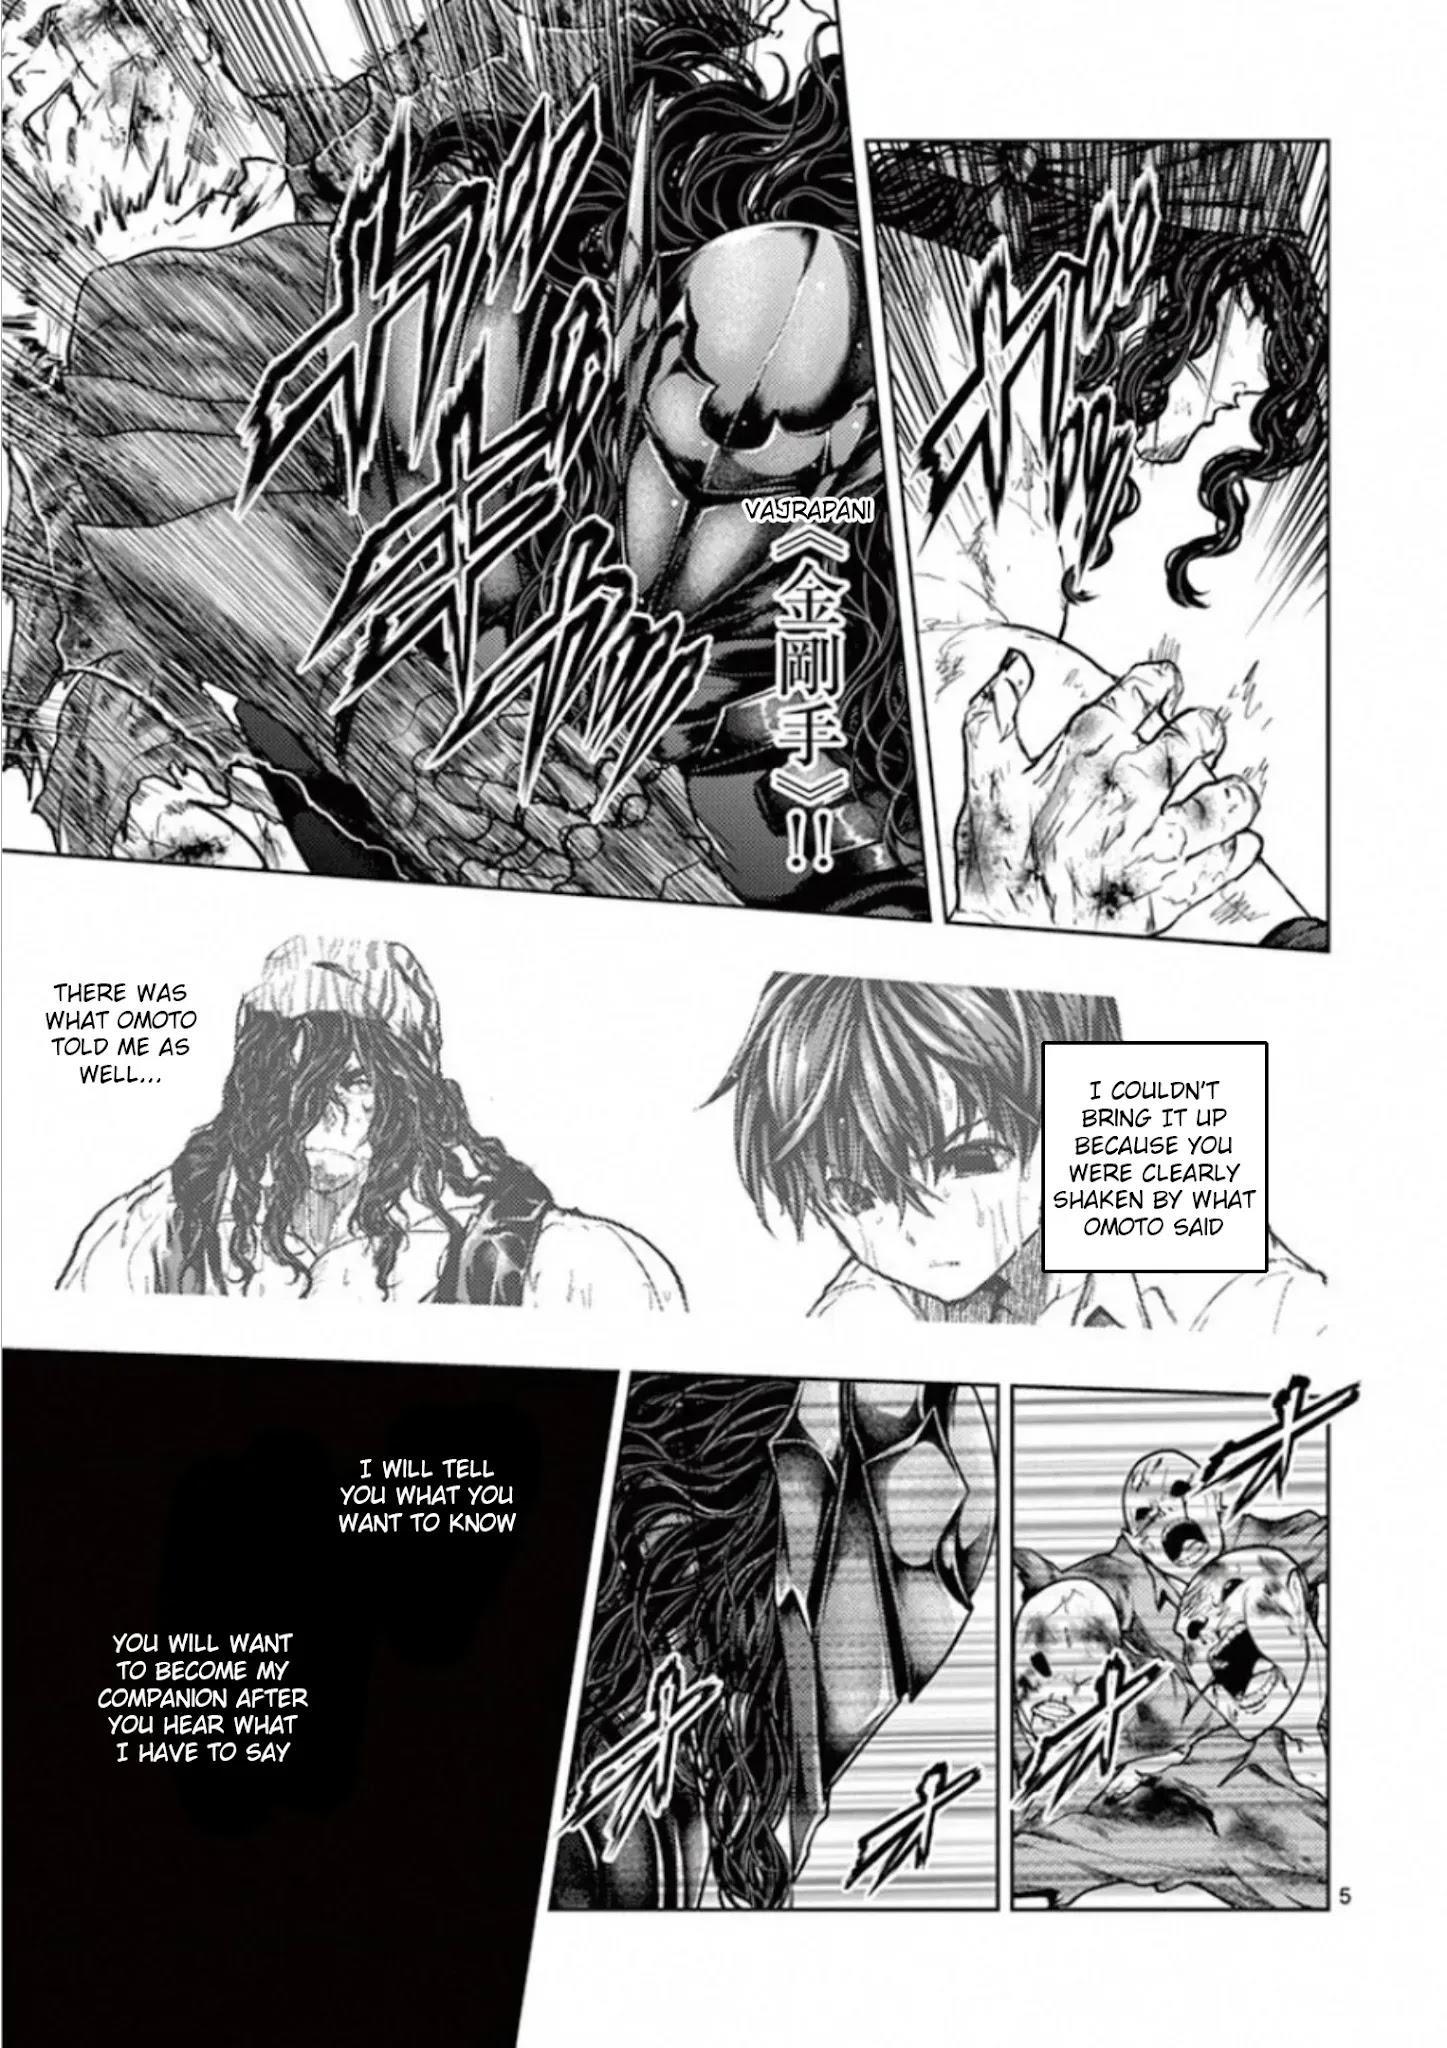 Deatte 5 Byou De Battle Chapter 139: The Strongest Man page 5 - Mangakakalots.com